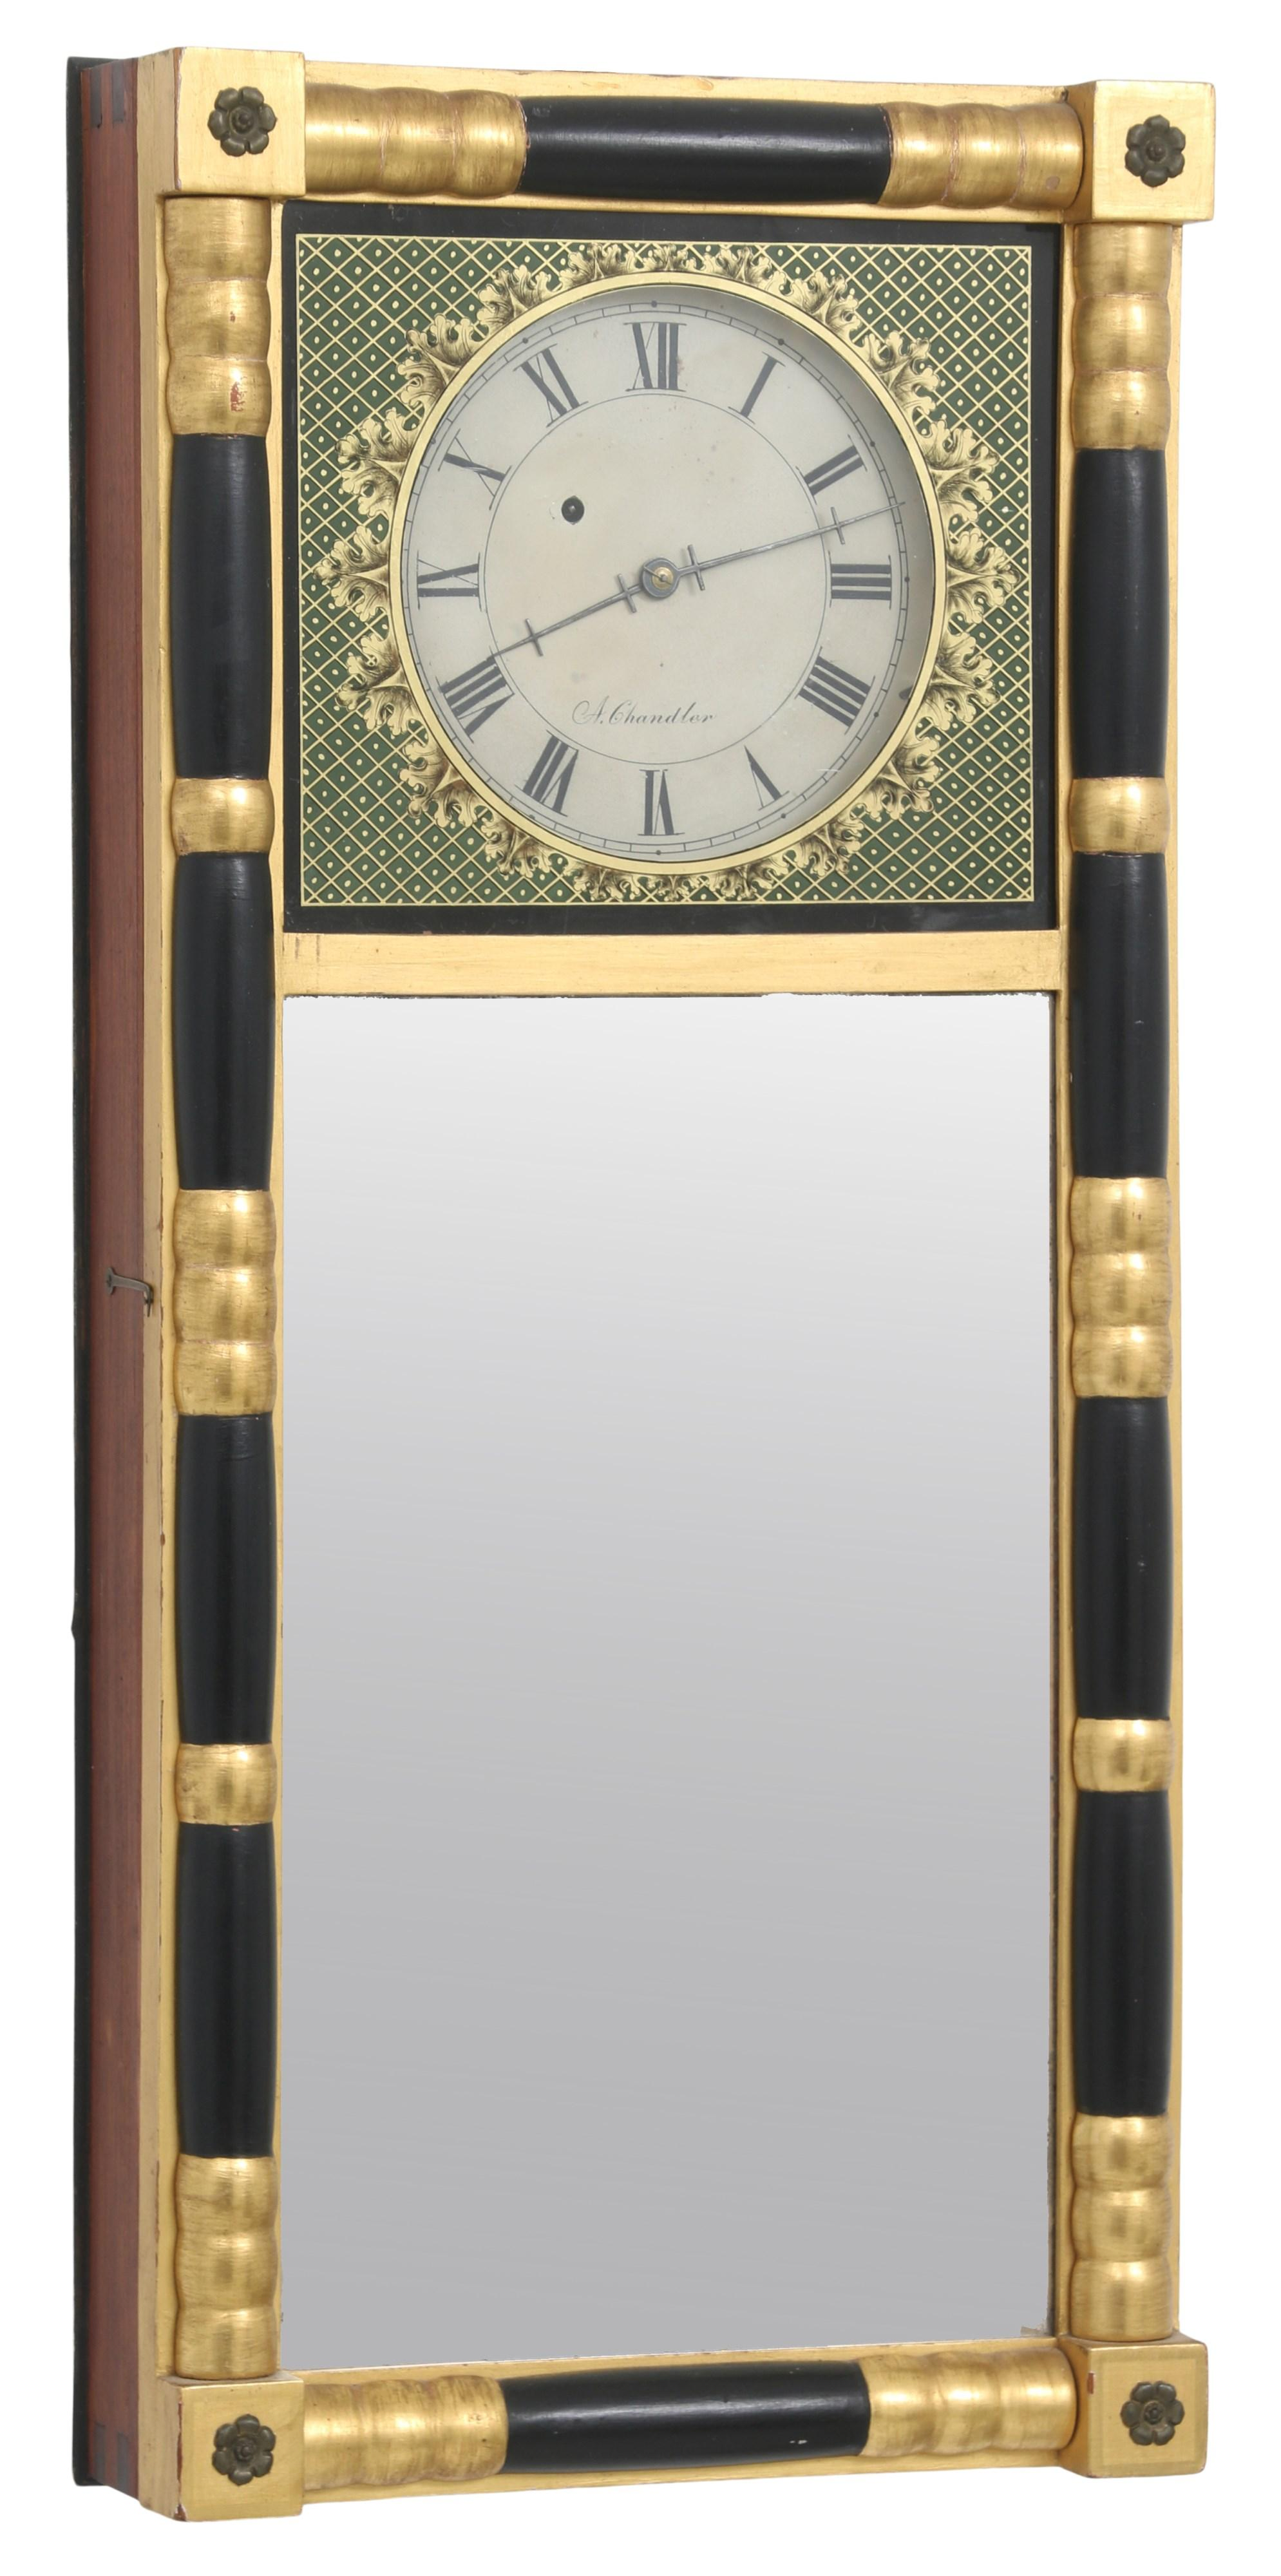 Abiel Chandler New Hampshire Mirror Clock